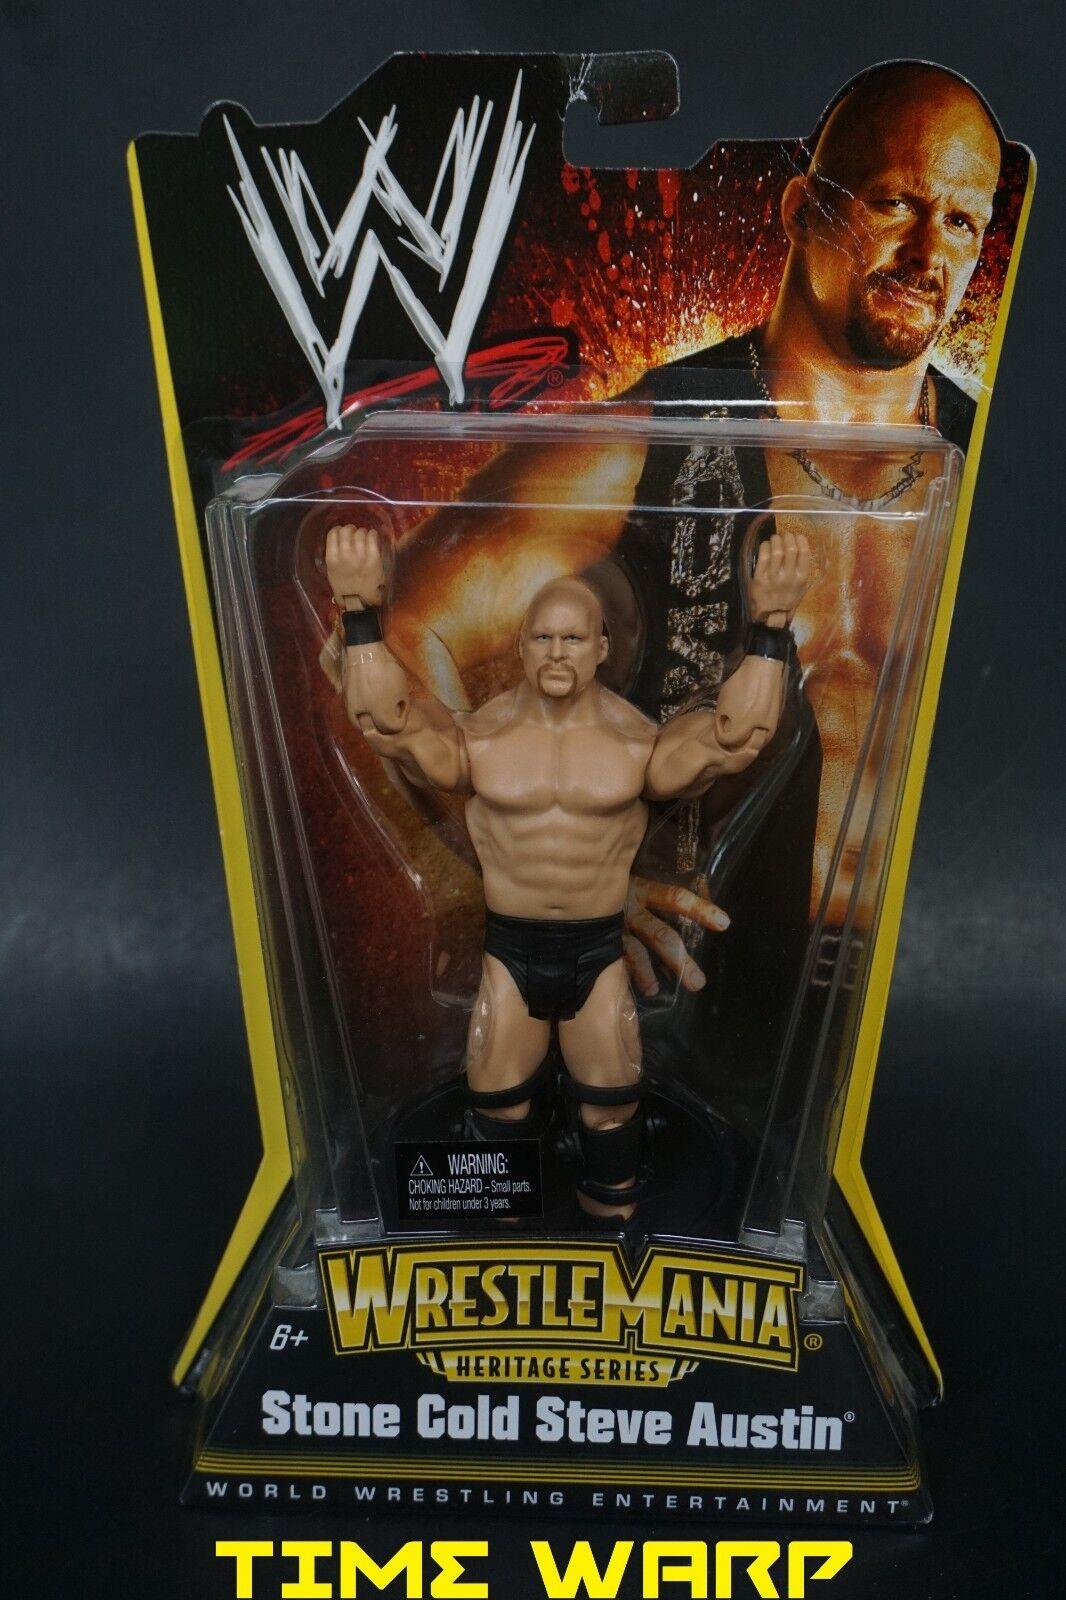 WWE STONE COLD STEVE AUSTIN WRESTLEMANIA HERITAGE SERIES WRESTLEMANIA X-7 FIGURE